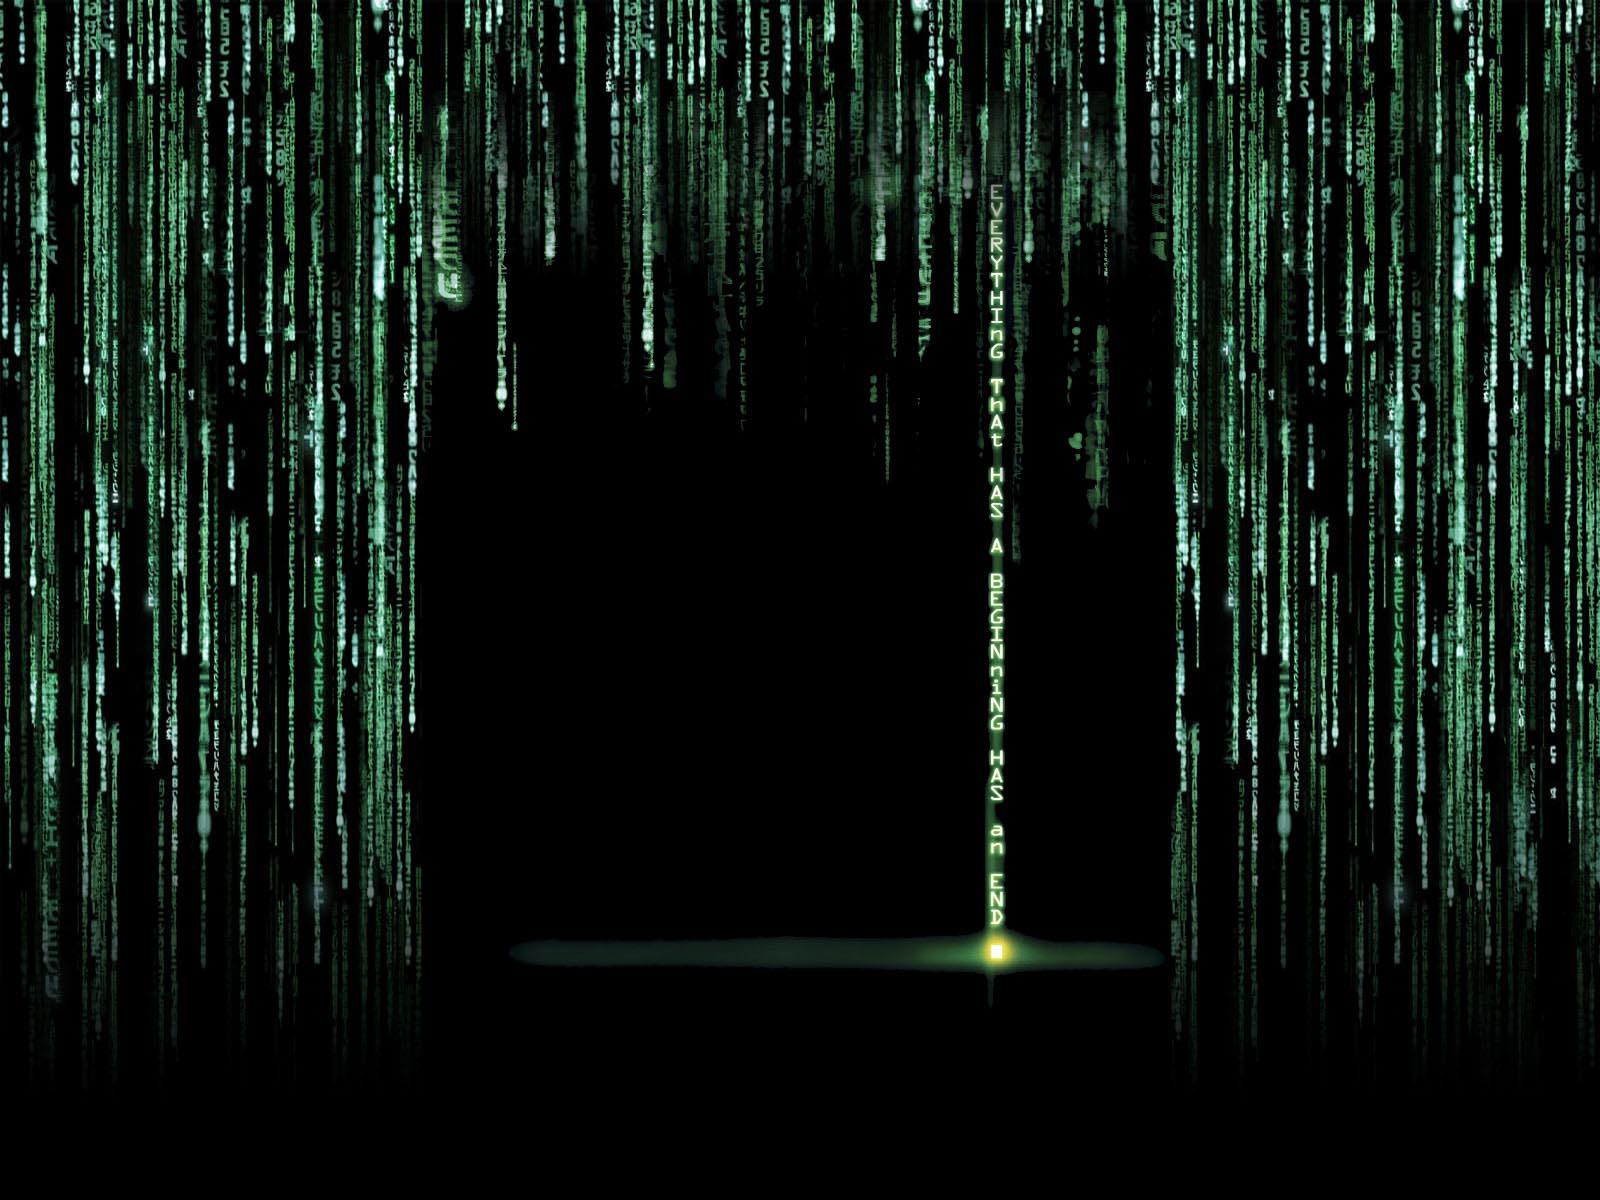 3d Moving Matrix Desktop Wallpapers And Backgrounds